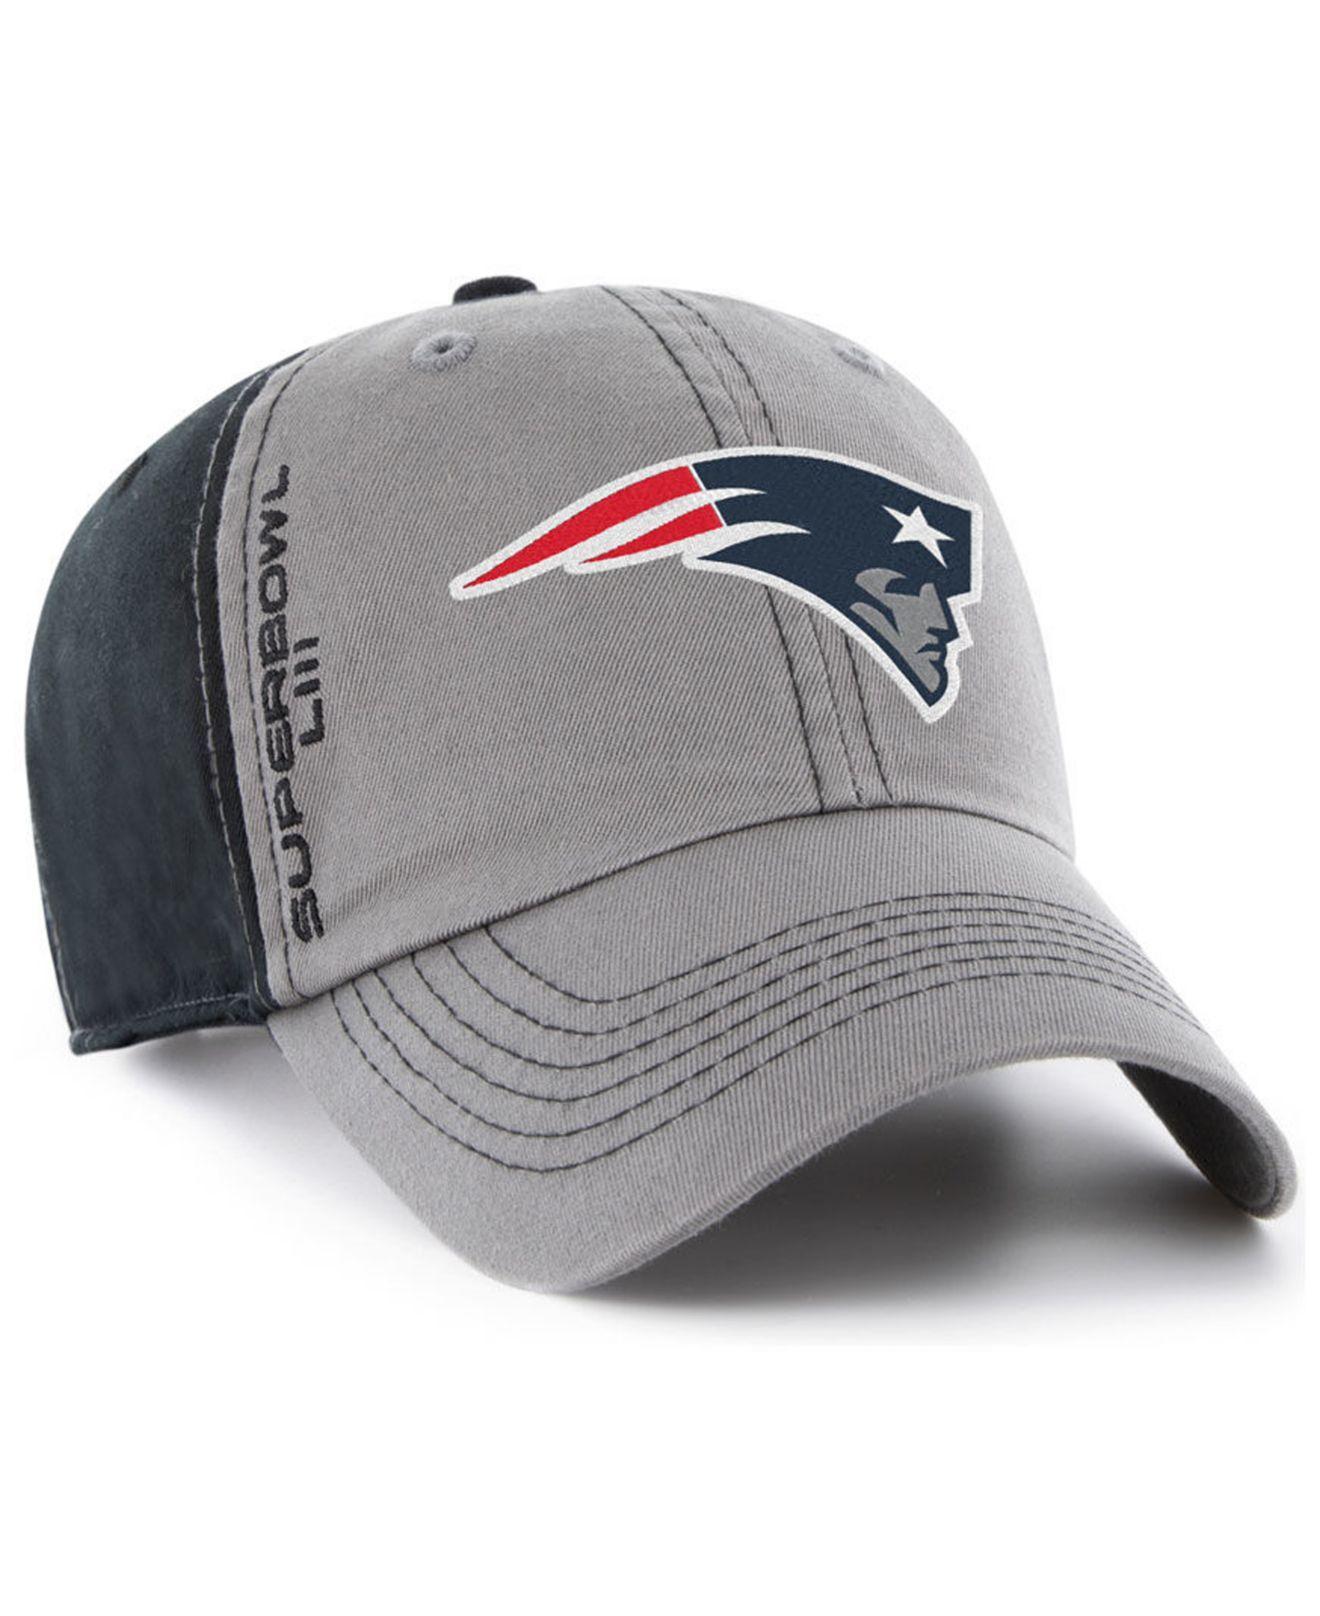 best value 2df74 6f801 47 Brand New England Patriots Super Bowl Liii Climb Clean Up ...